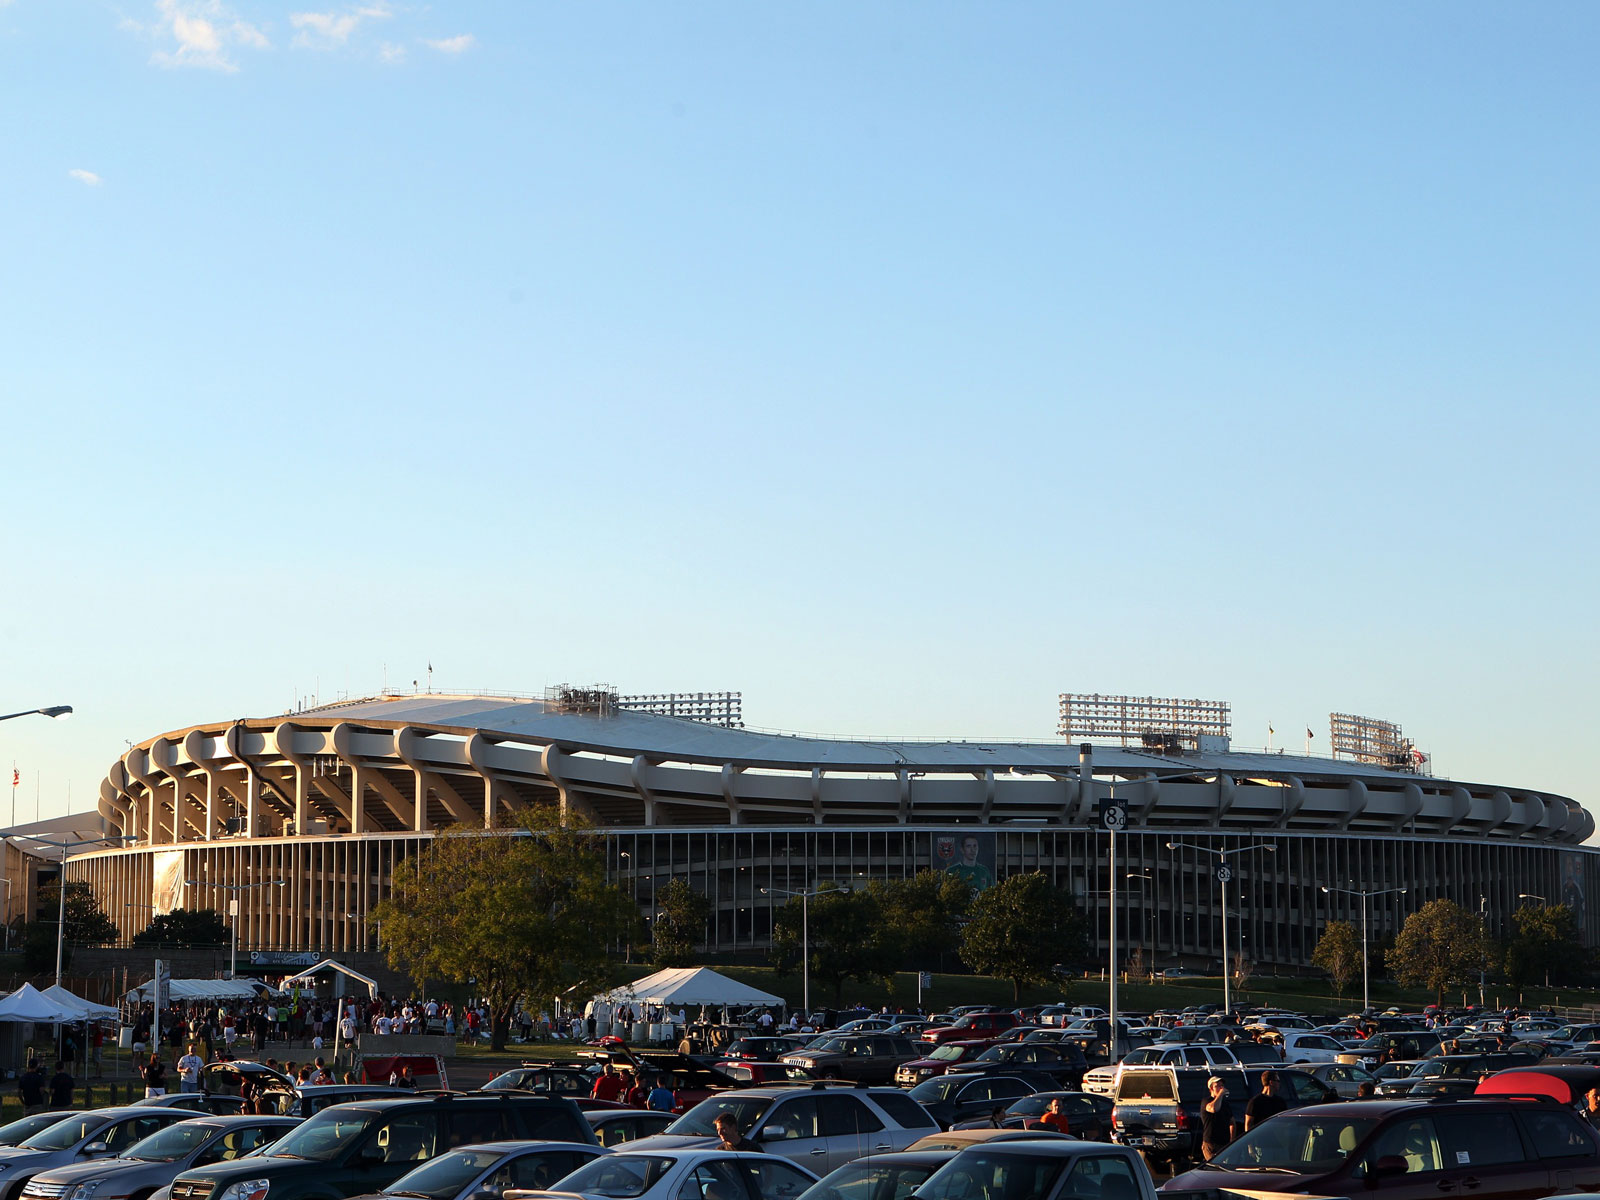 RFK Stadium will close its doors to DC United after Sunday's match